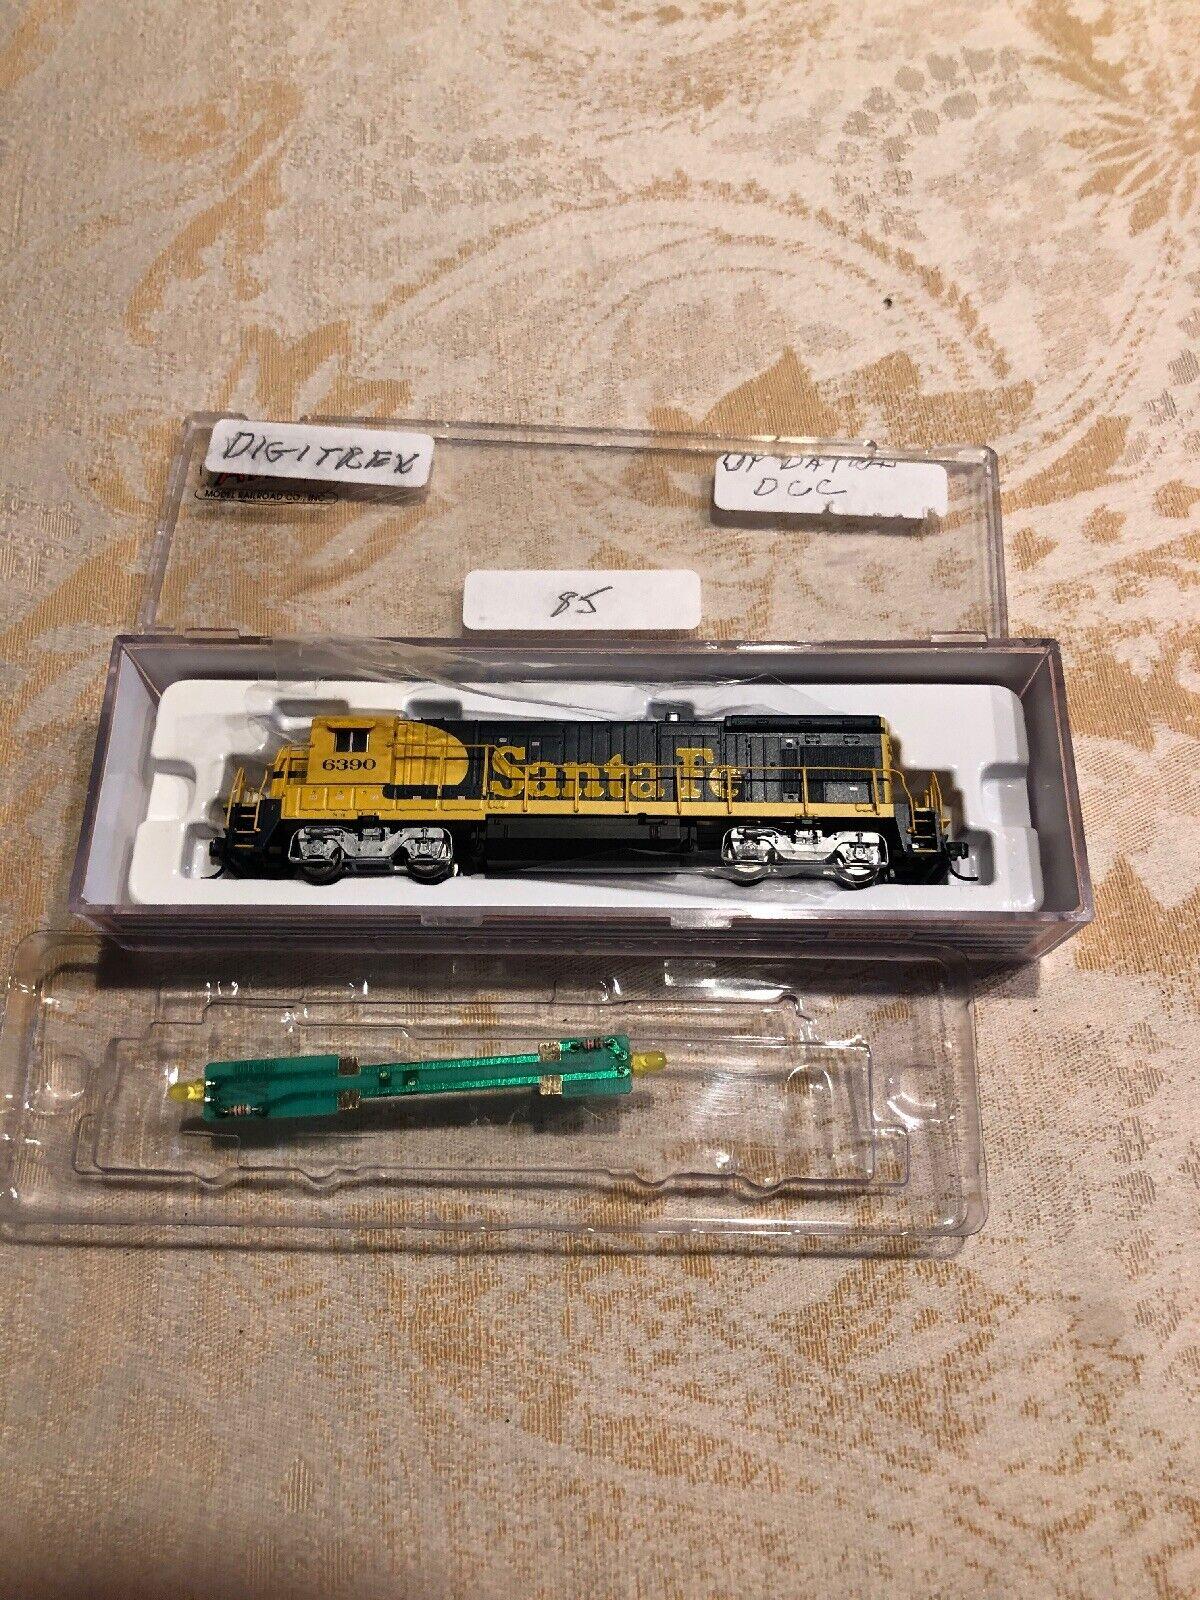 NOS ATLAS 49707 B23-7 Locomotive SANTA FE DCC EQUIPPED DIESEL TRAIN N